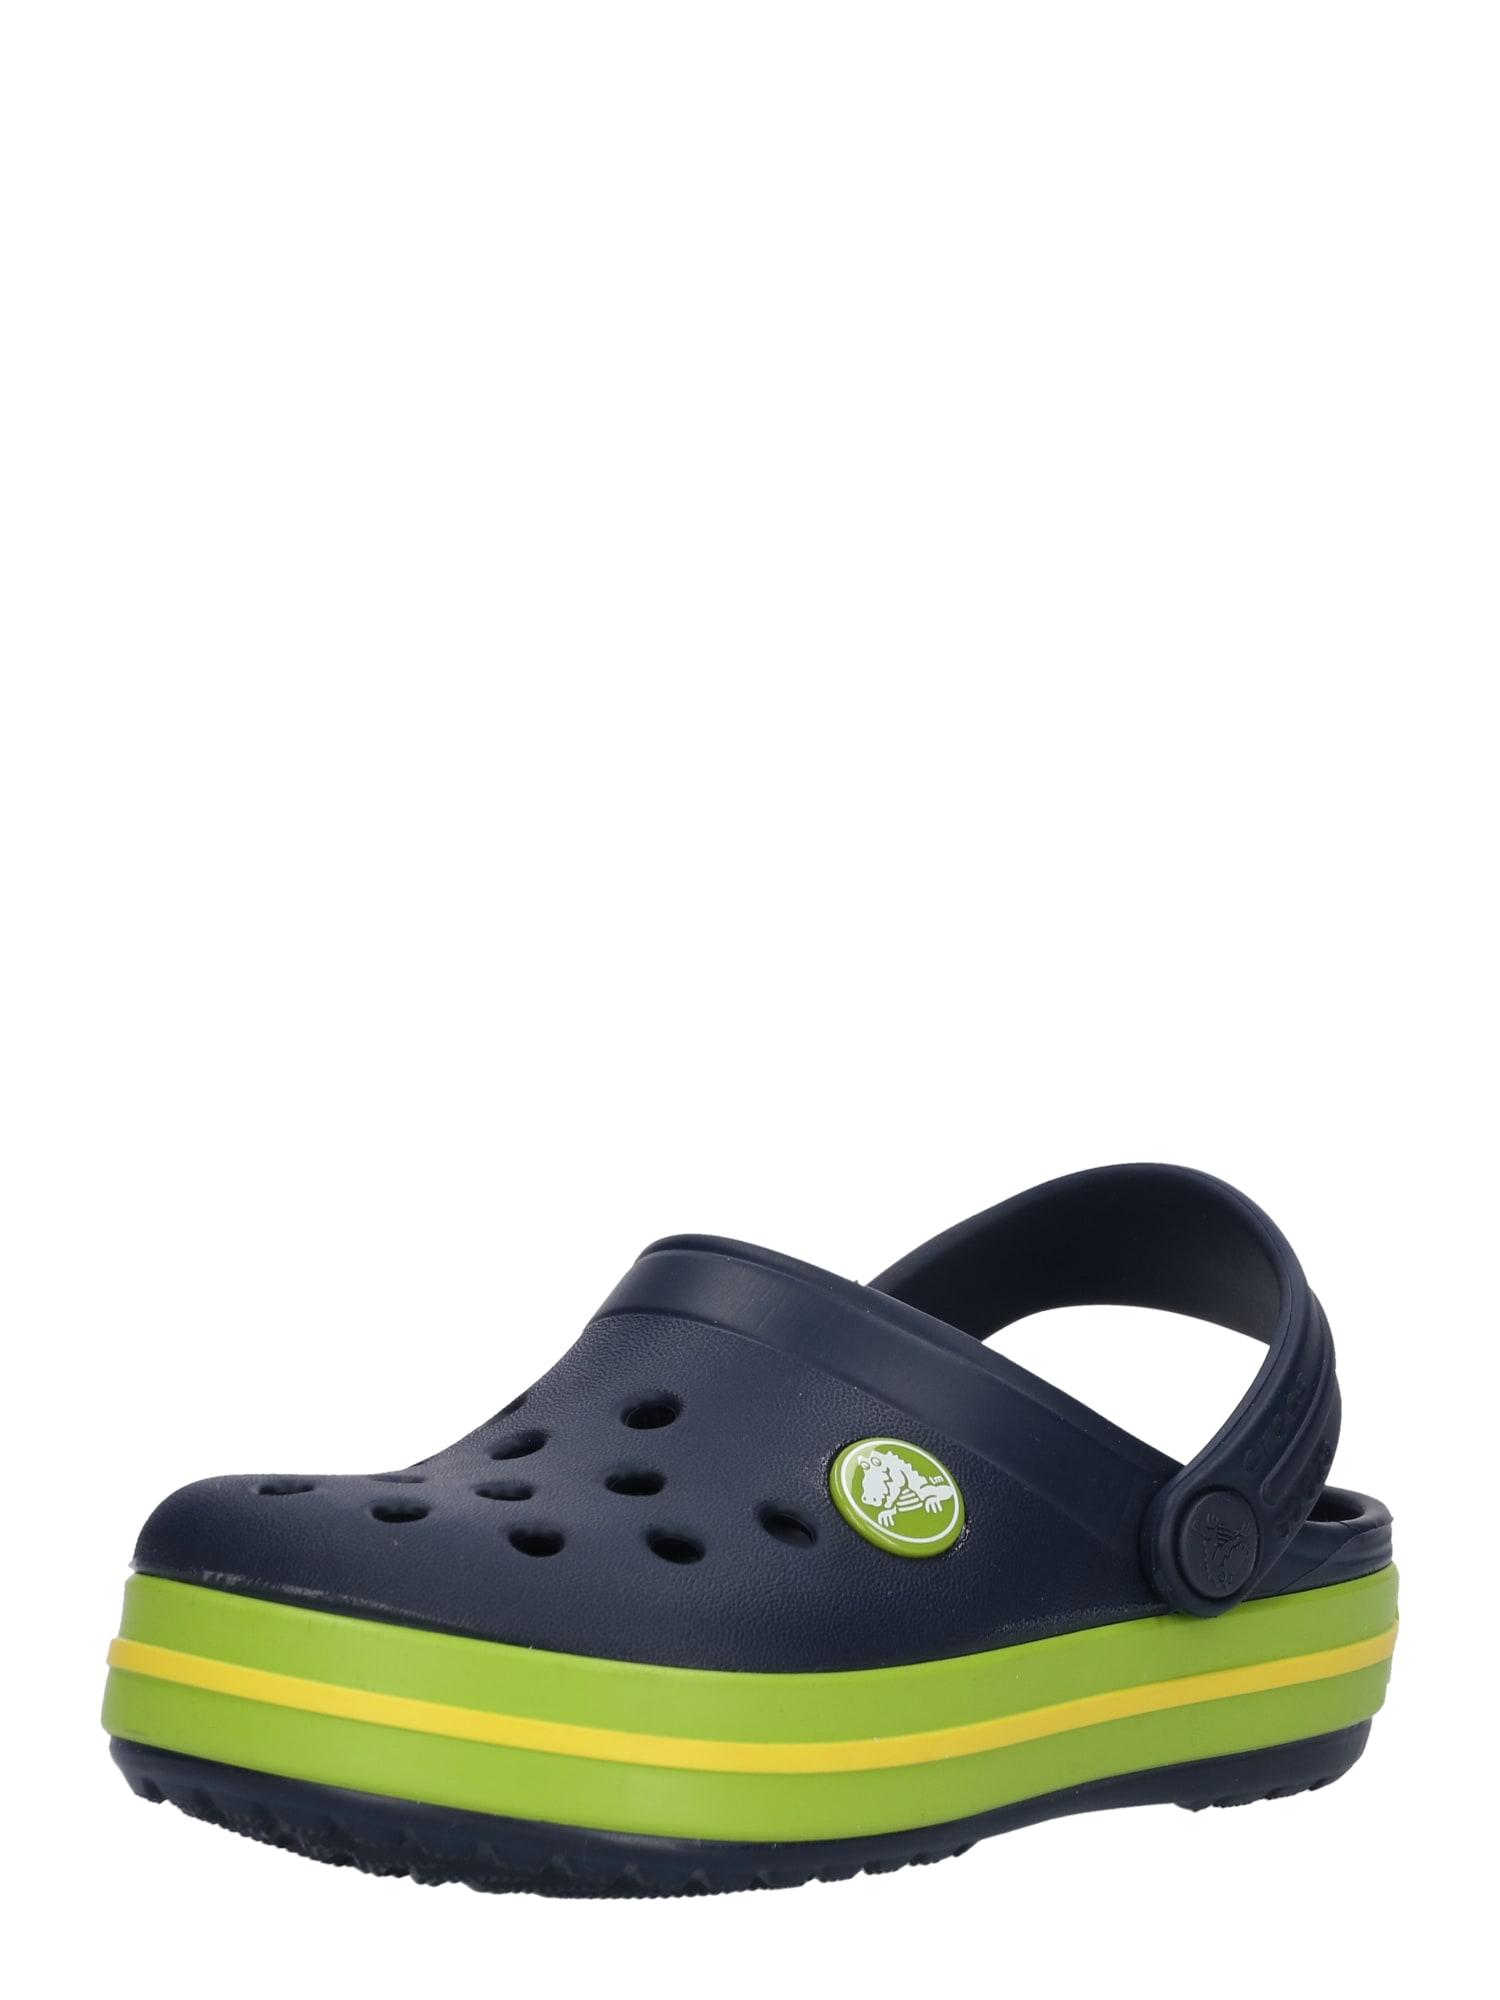 Crocs Atviri batai žalia / mėlyna